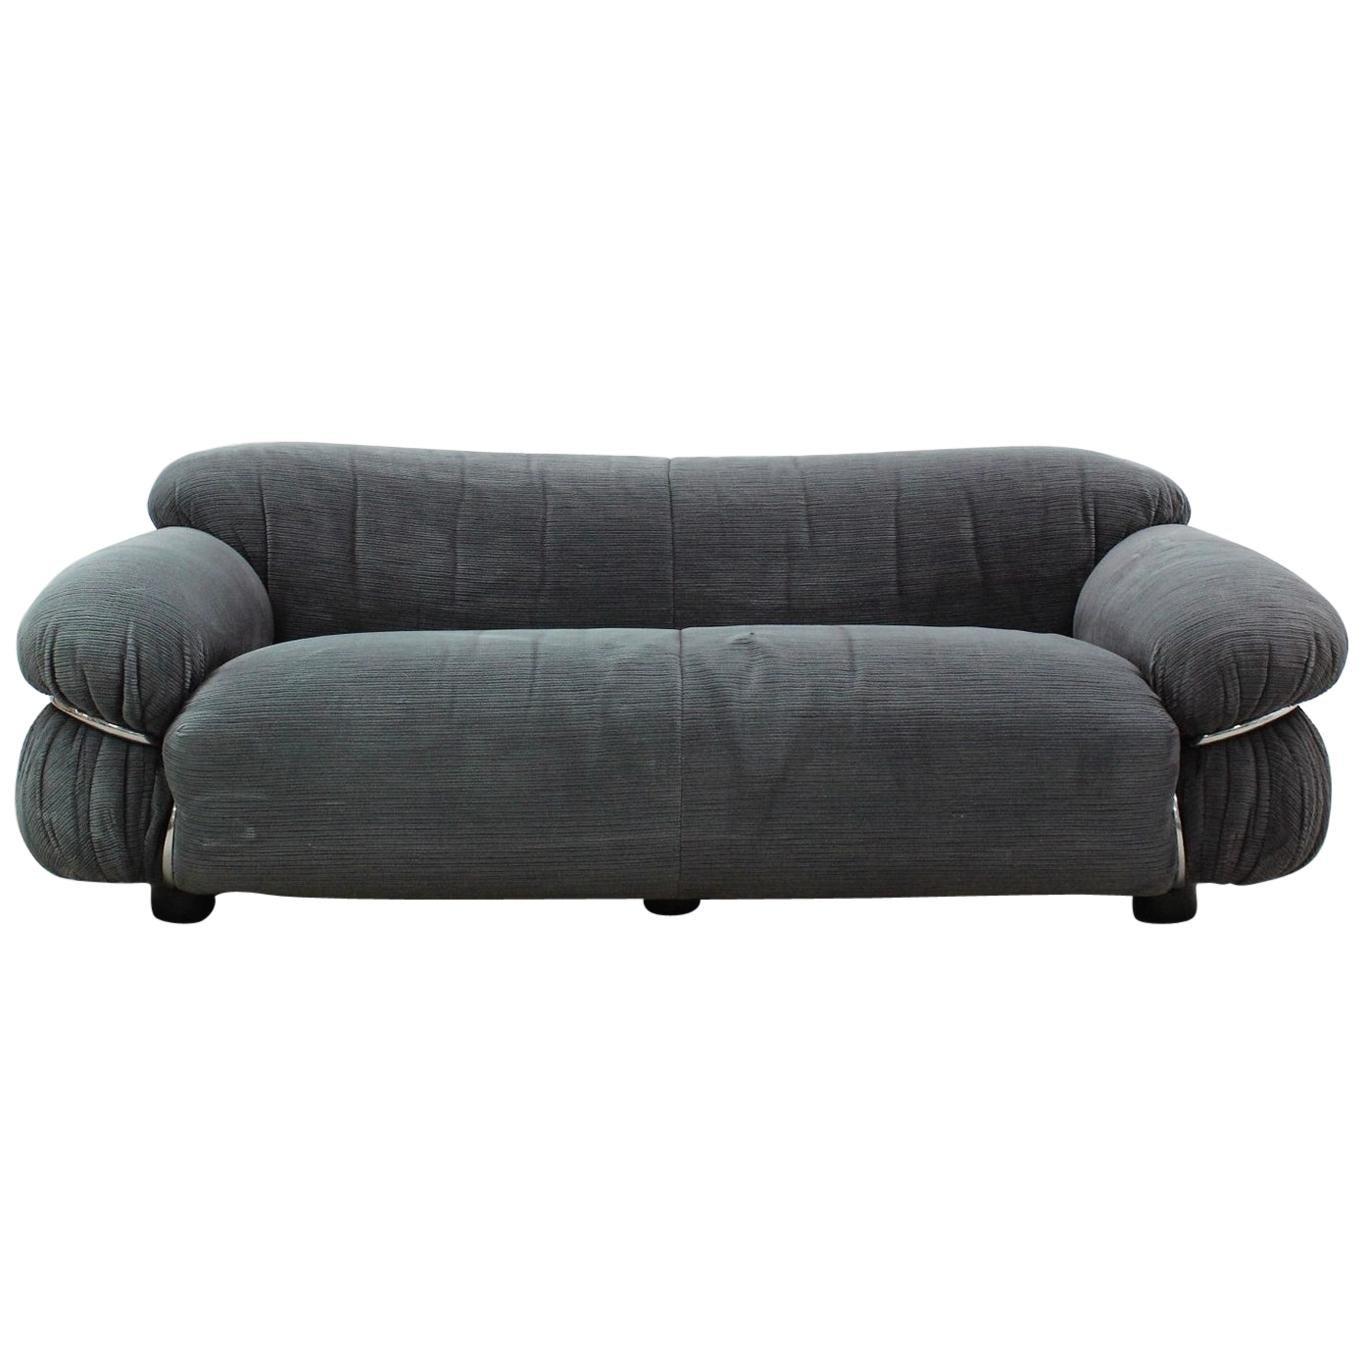 Tacchini Sesann Sofa Designed by Gianfranco Frattini with Chrome Frame